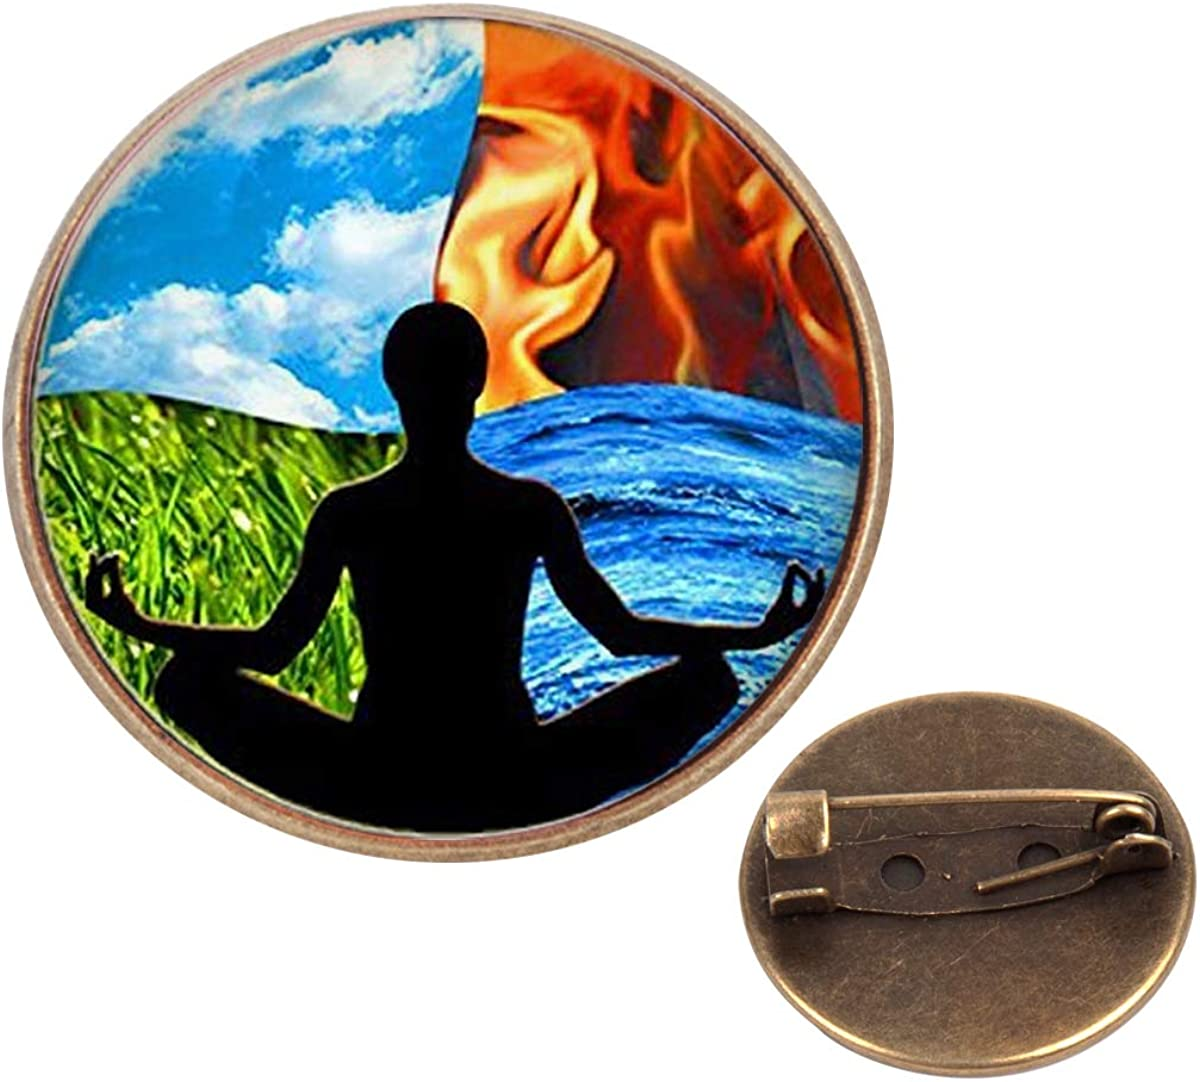 Pinback Buttons Badges Pins 4 Seasons Meditation People Lapel Pin Brooch Clip Trendy Accessory Jacket T-Shirt Bag Hat Shoe